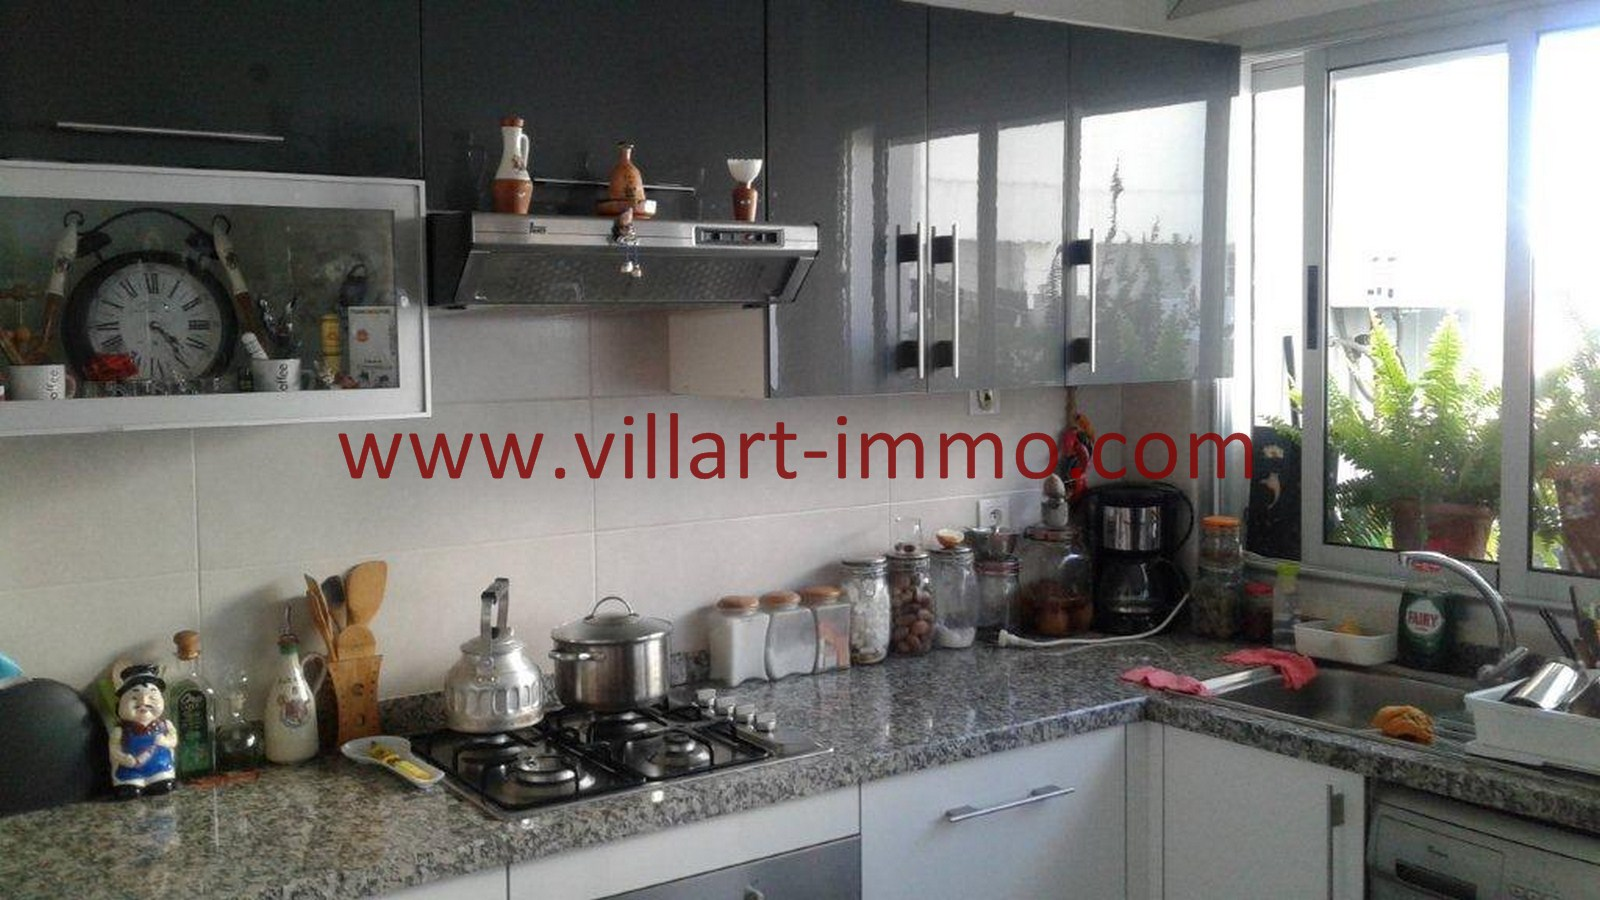 6-A louer-Appartement-Tanger-Castilla-Cuisine-L1040-Villart immo-Agence Immobilière